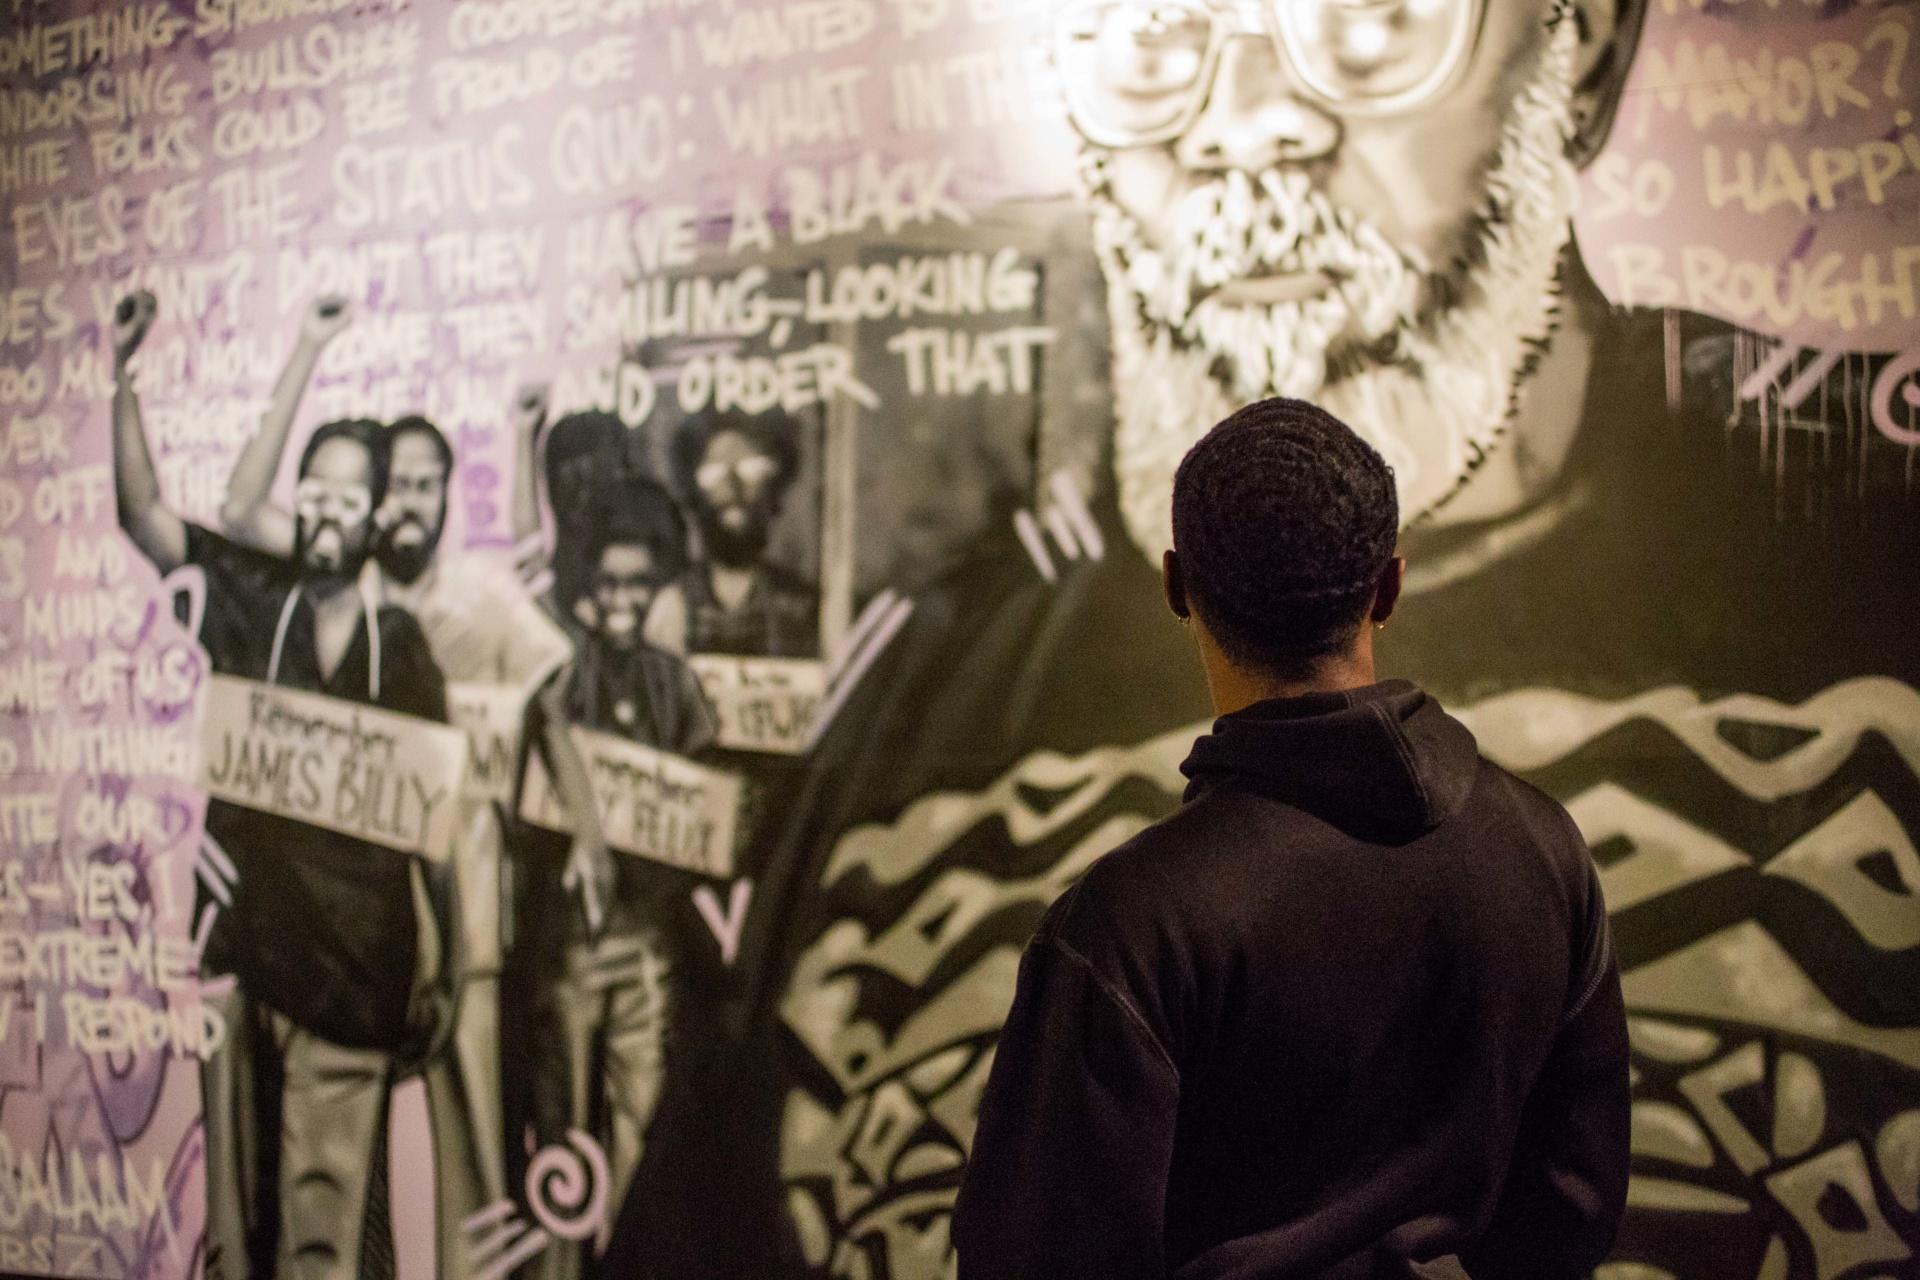 AYLF's Actions Toward Racial Equity